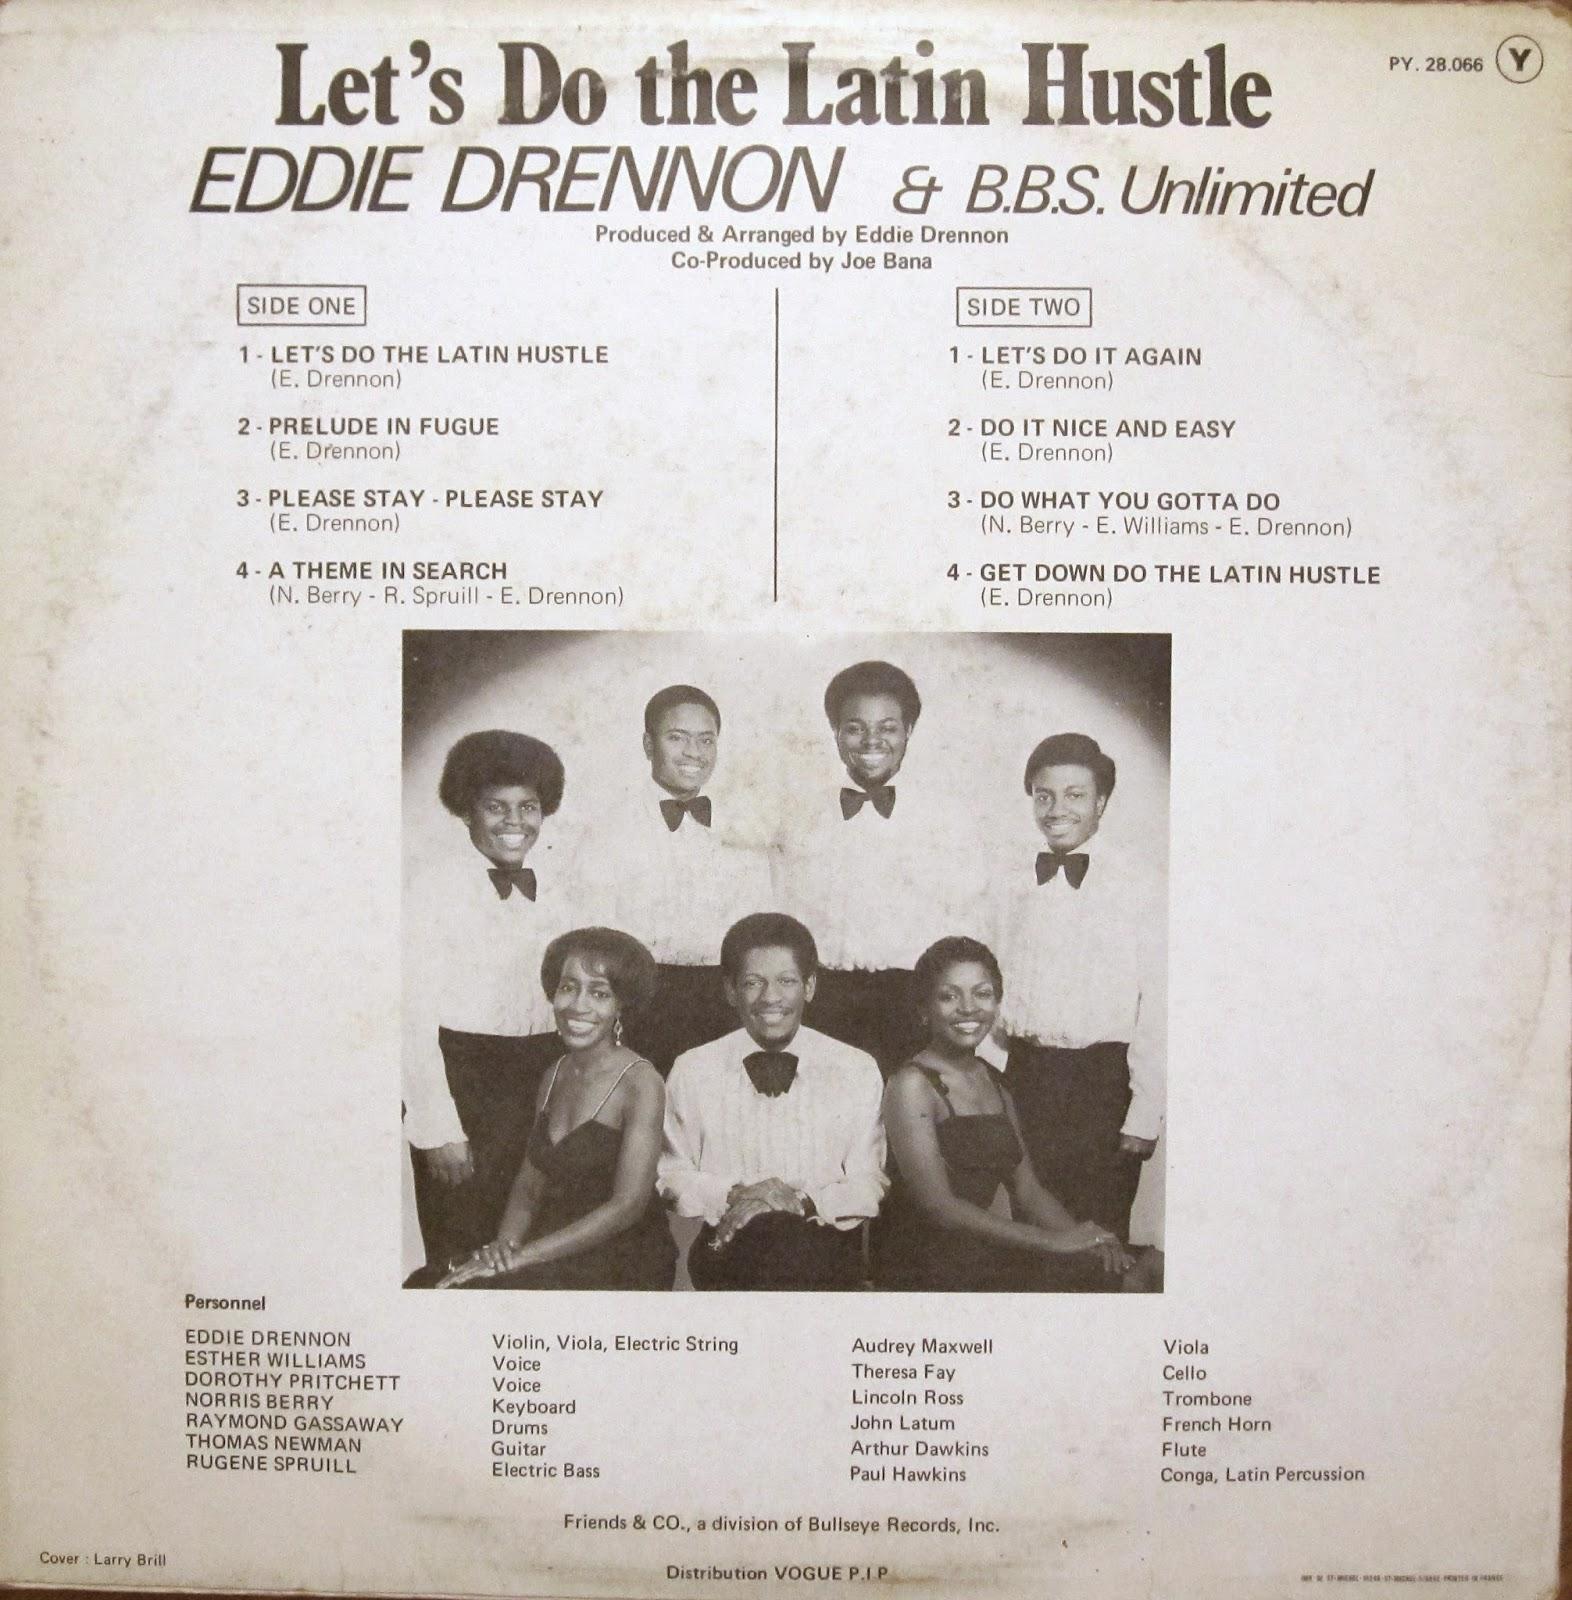 Eddie Drennon & The B.B.S. Unlimited* Eddie Drennon & B.B.S. Unlimited - Do It Nice And Easy